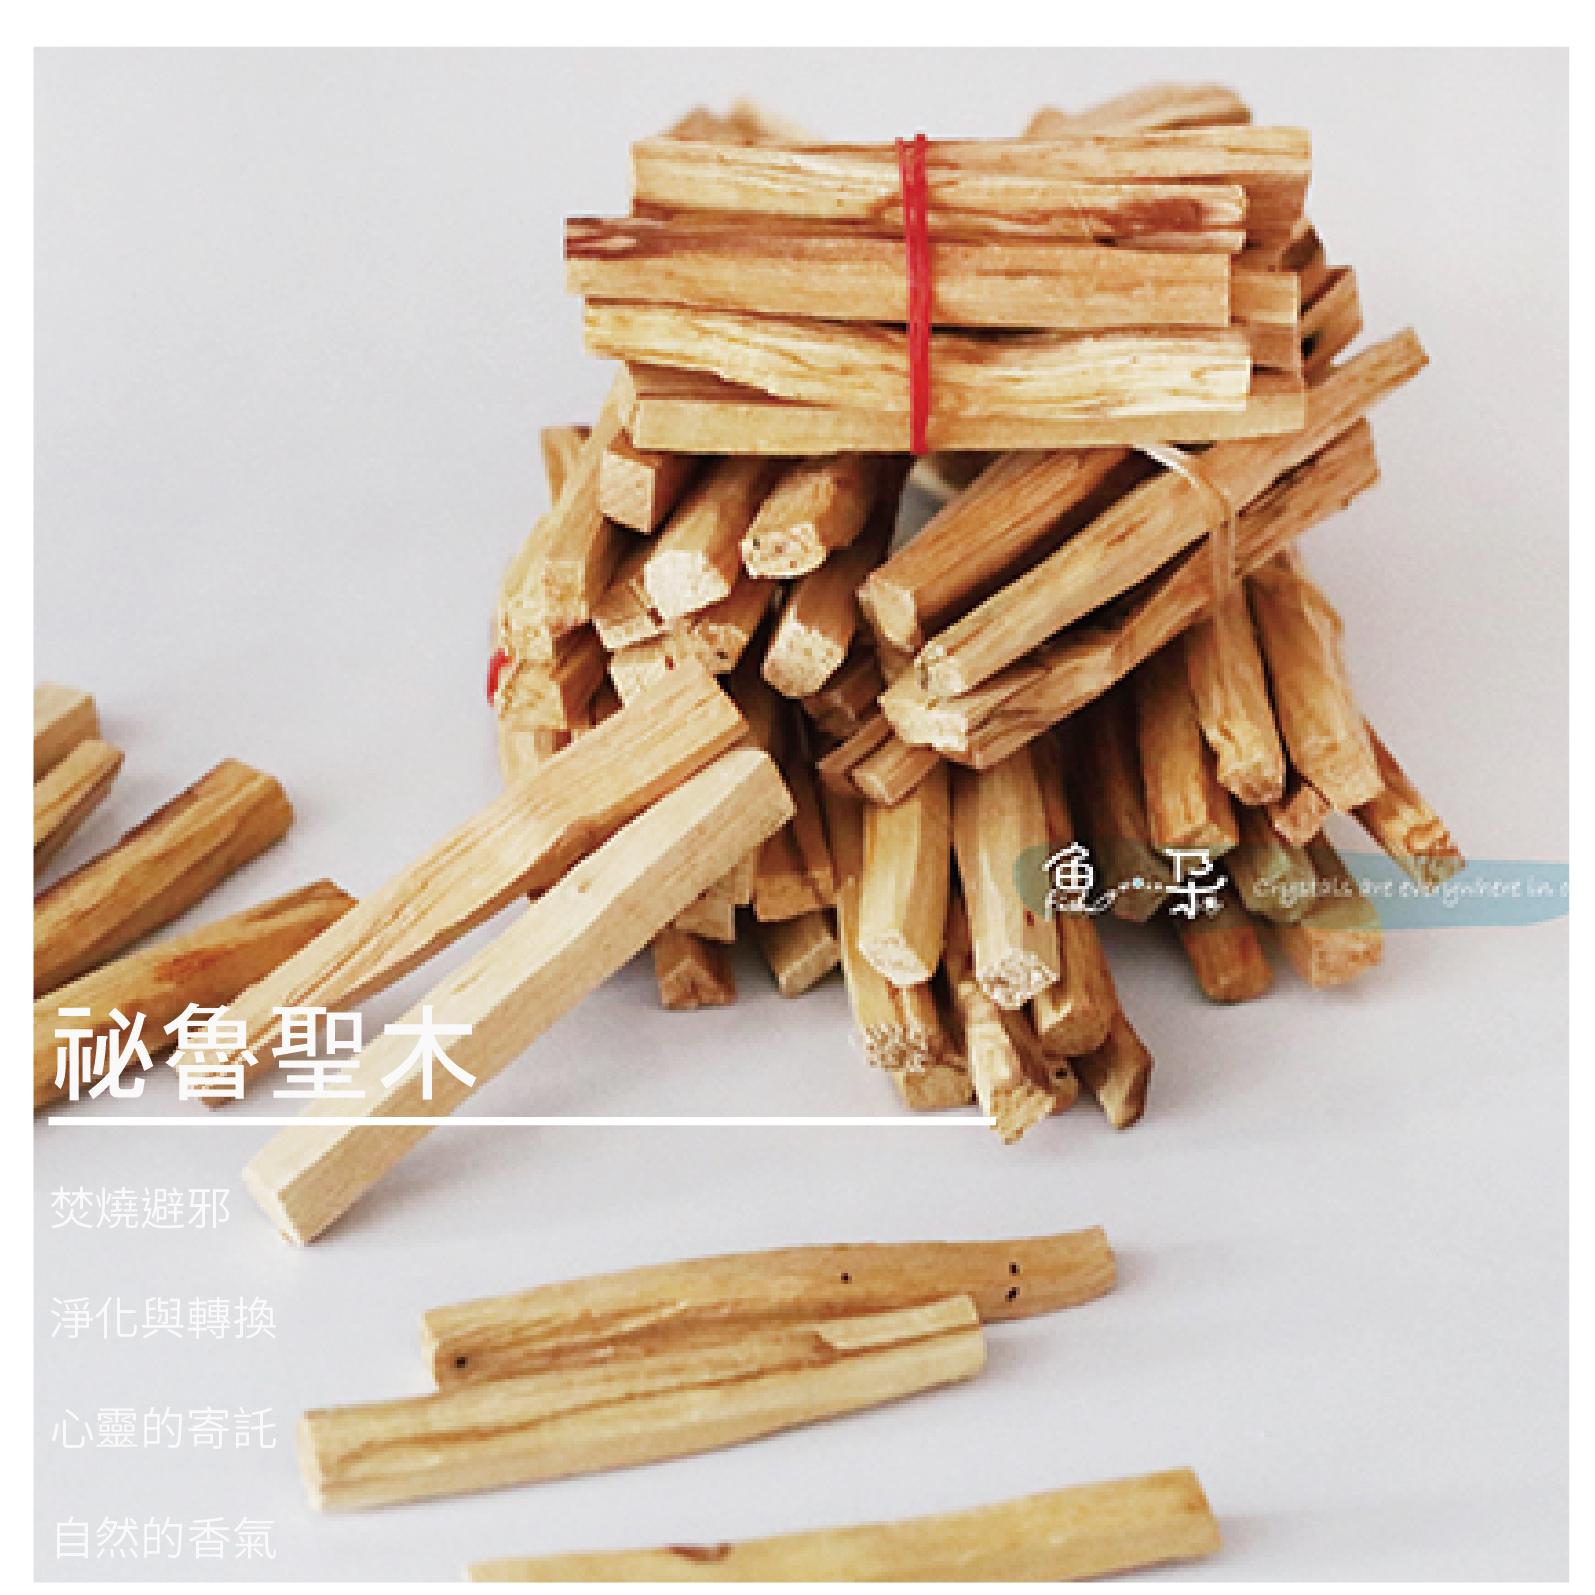 【魚朵】祕魯聖木(Palo Santo / Holy wood)